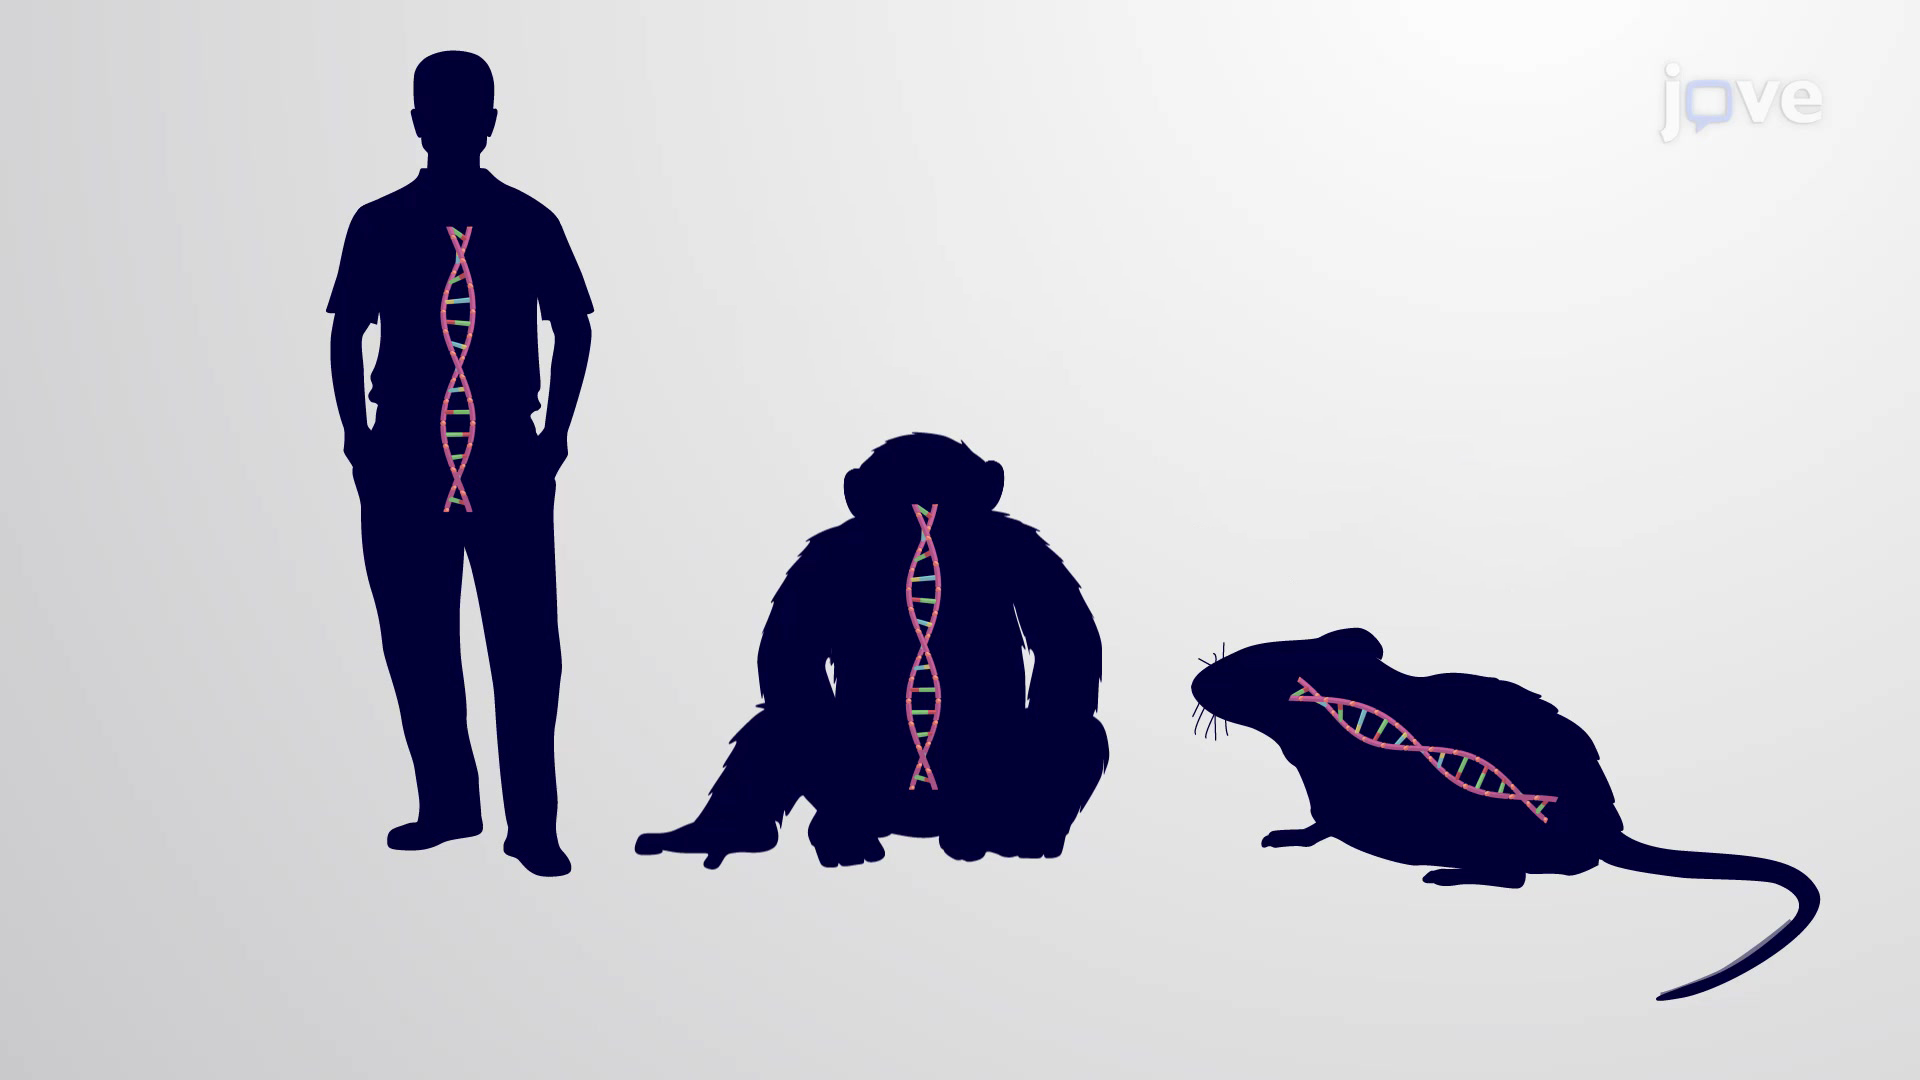 Evolutionary Relationships through Genome Comparisons